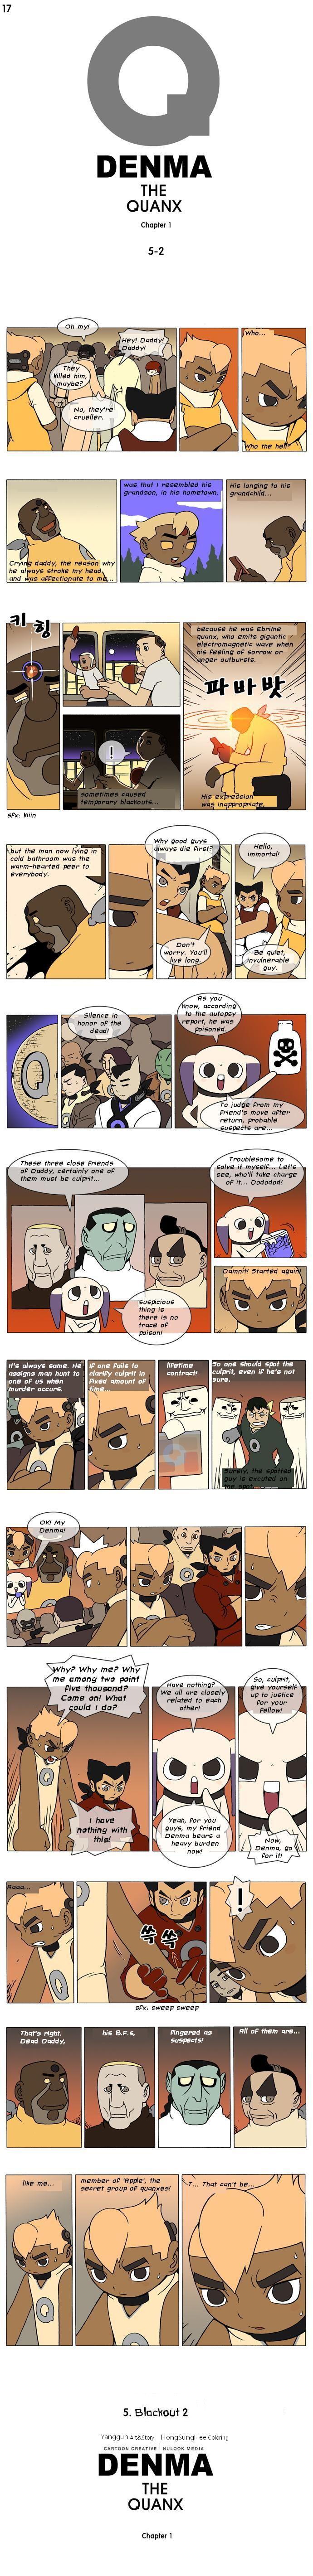 Denma 17 Page 1